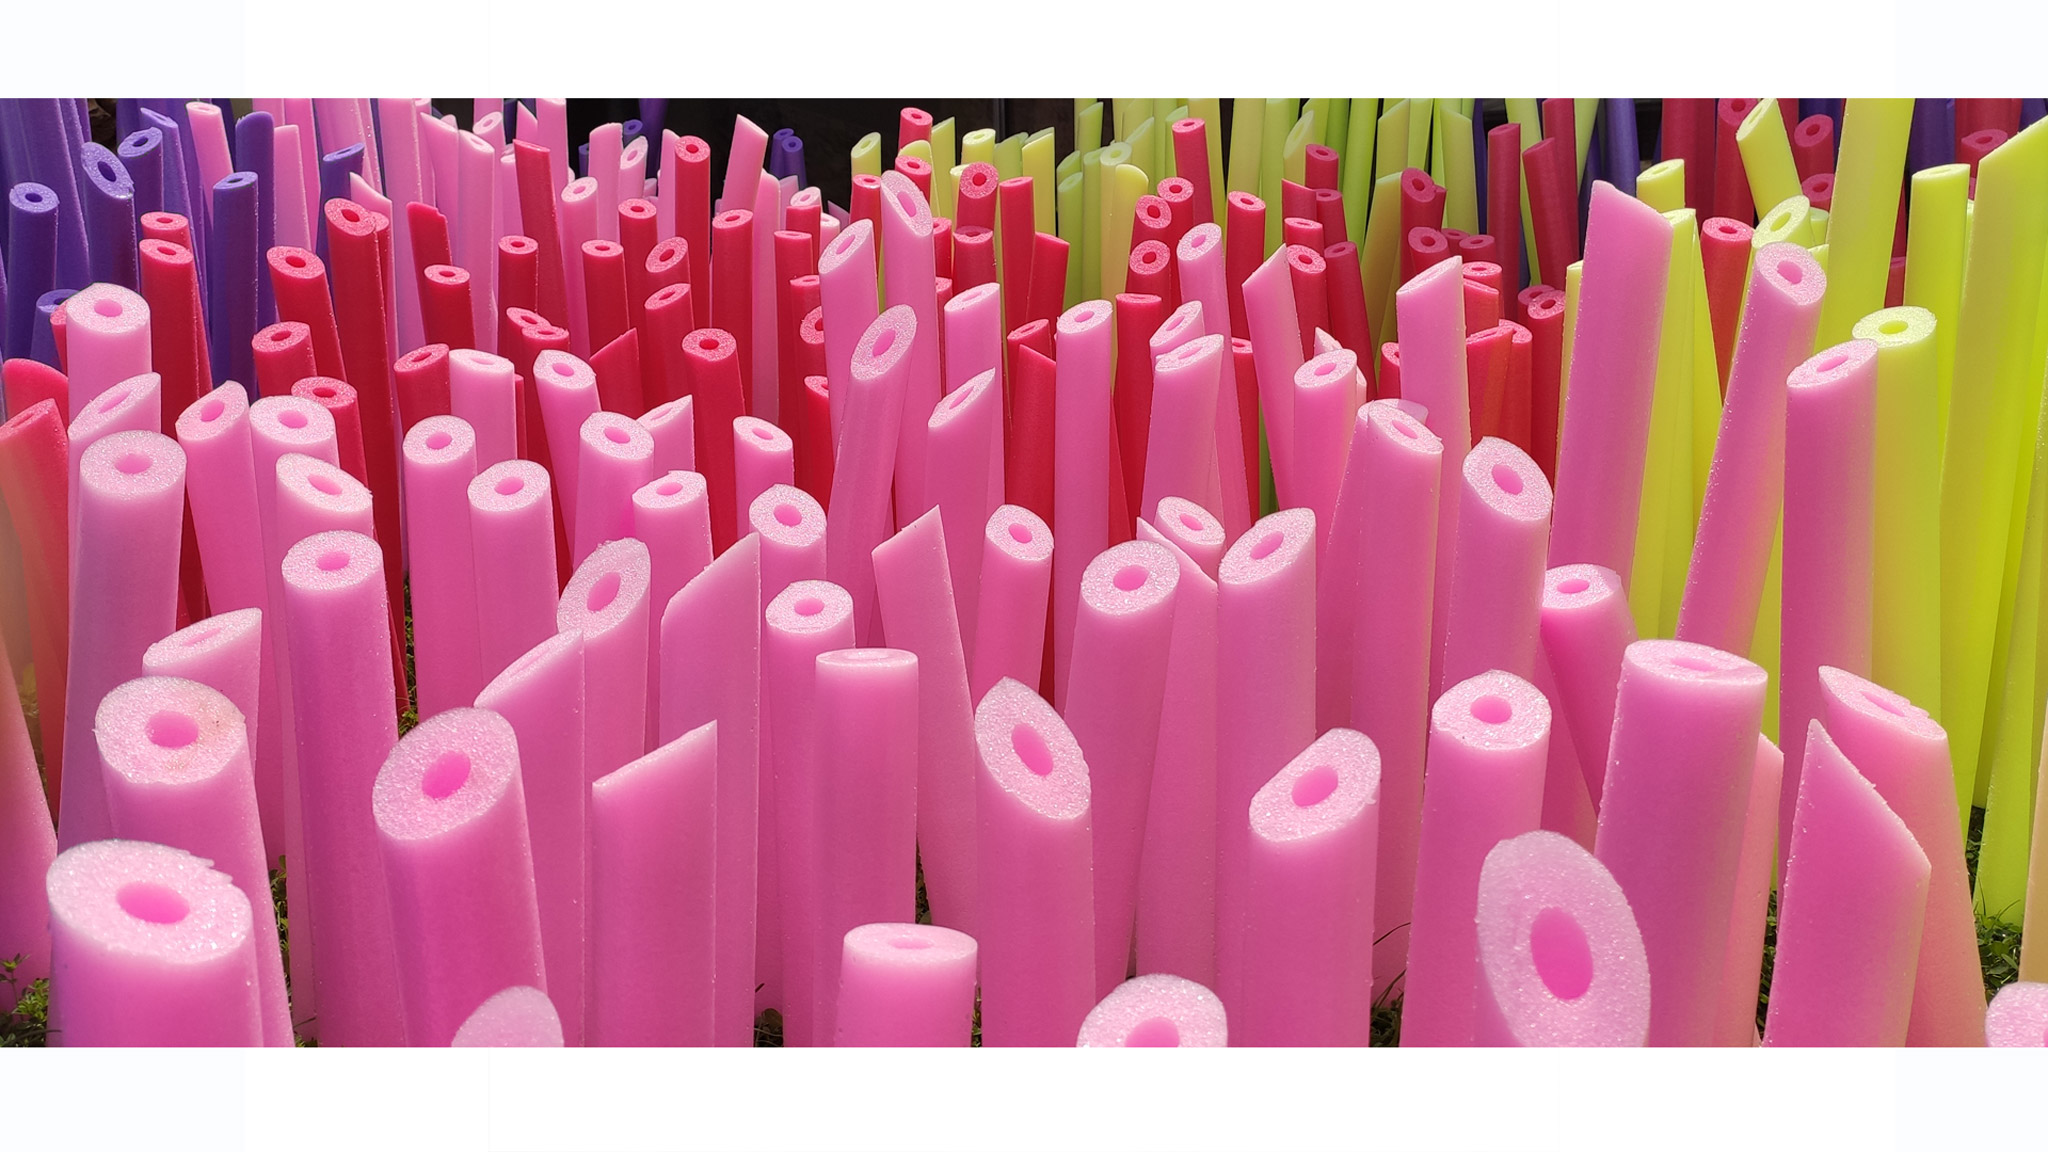 atelier4-anna-junca-interiorista-banyoles-interiorisme-noodles-flors-i-violes-palafrugell-web9